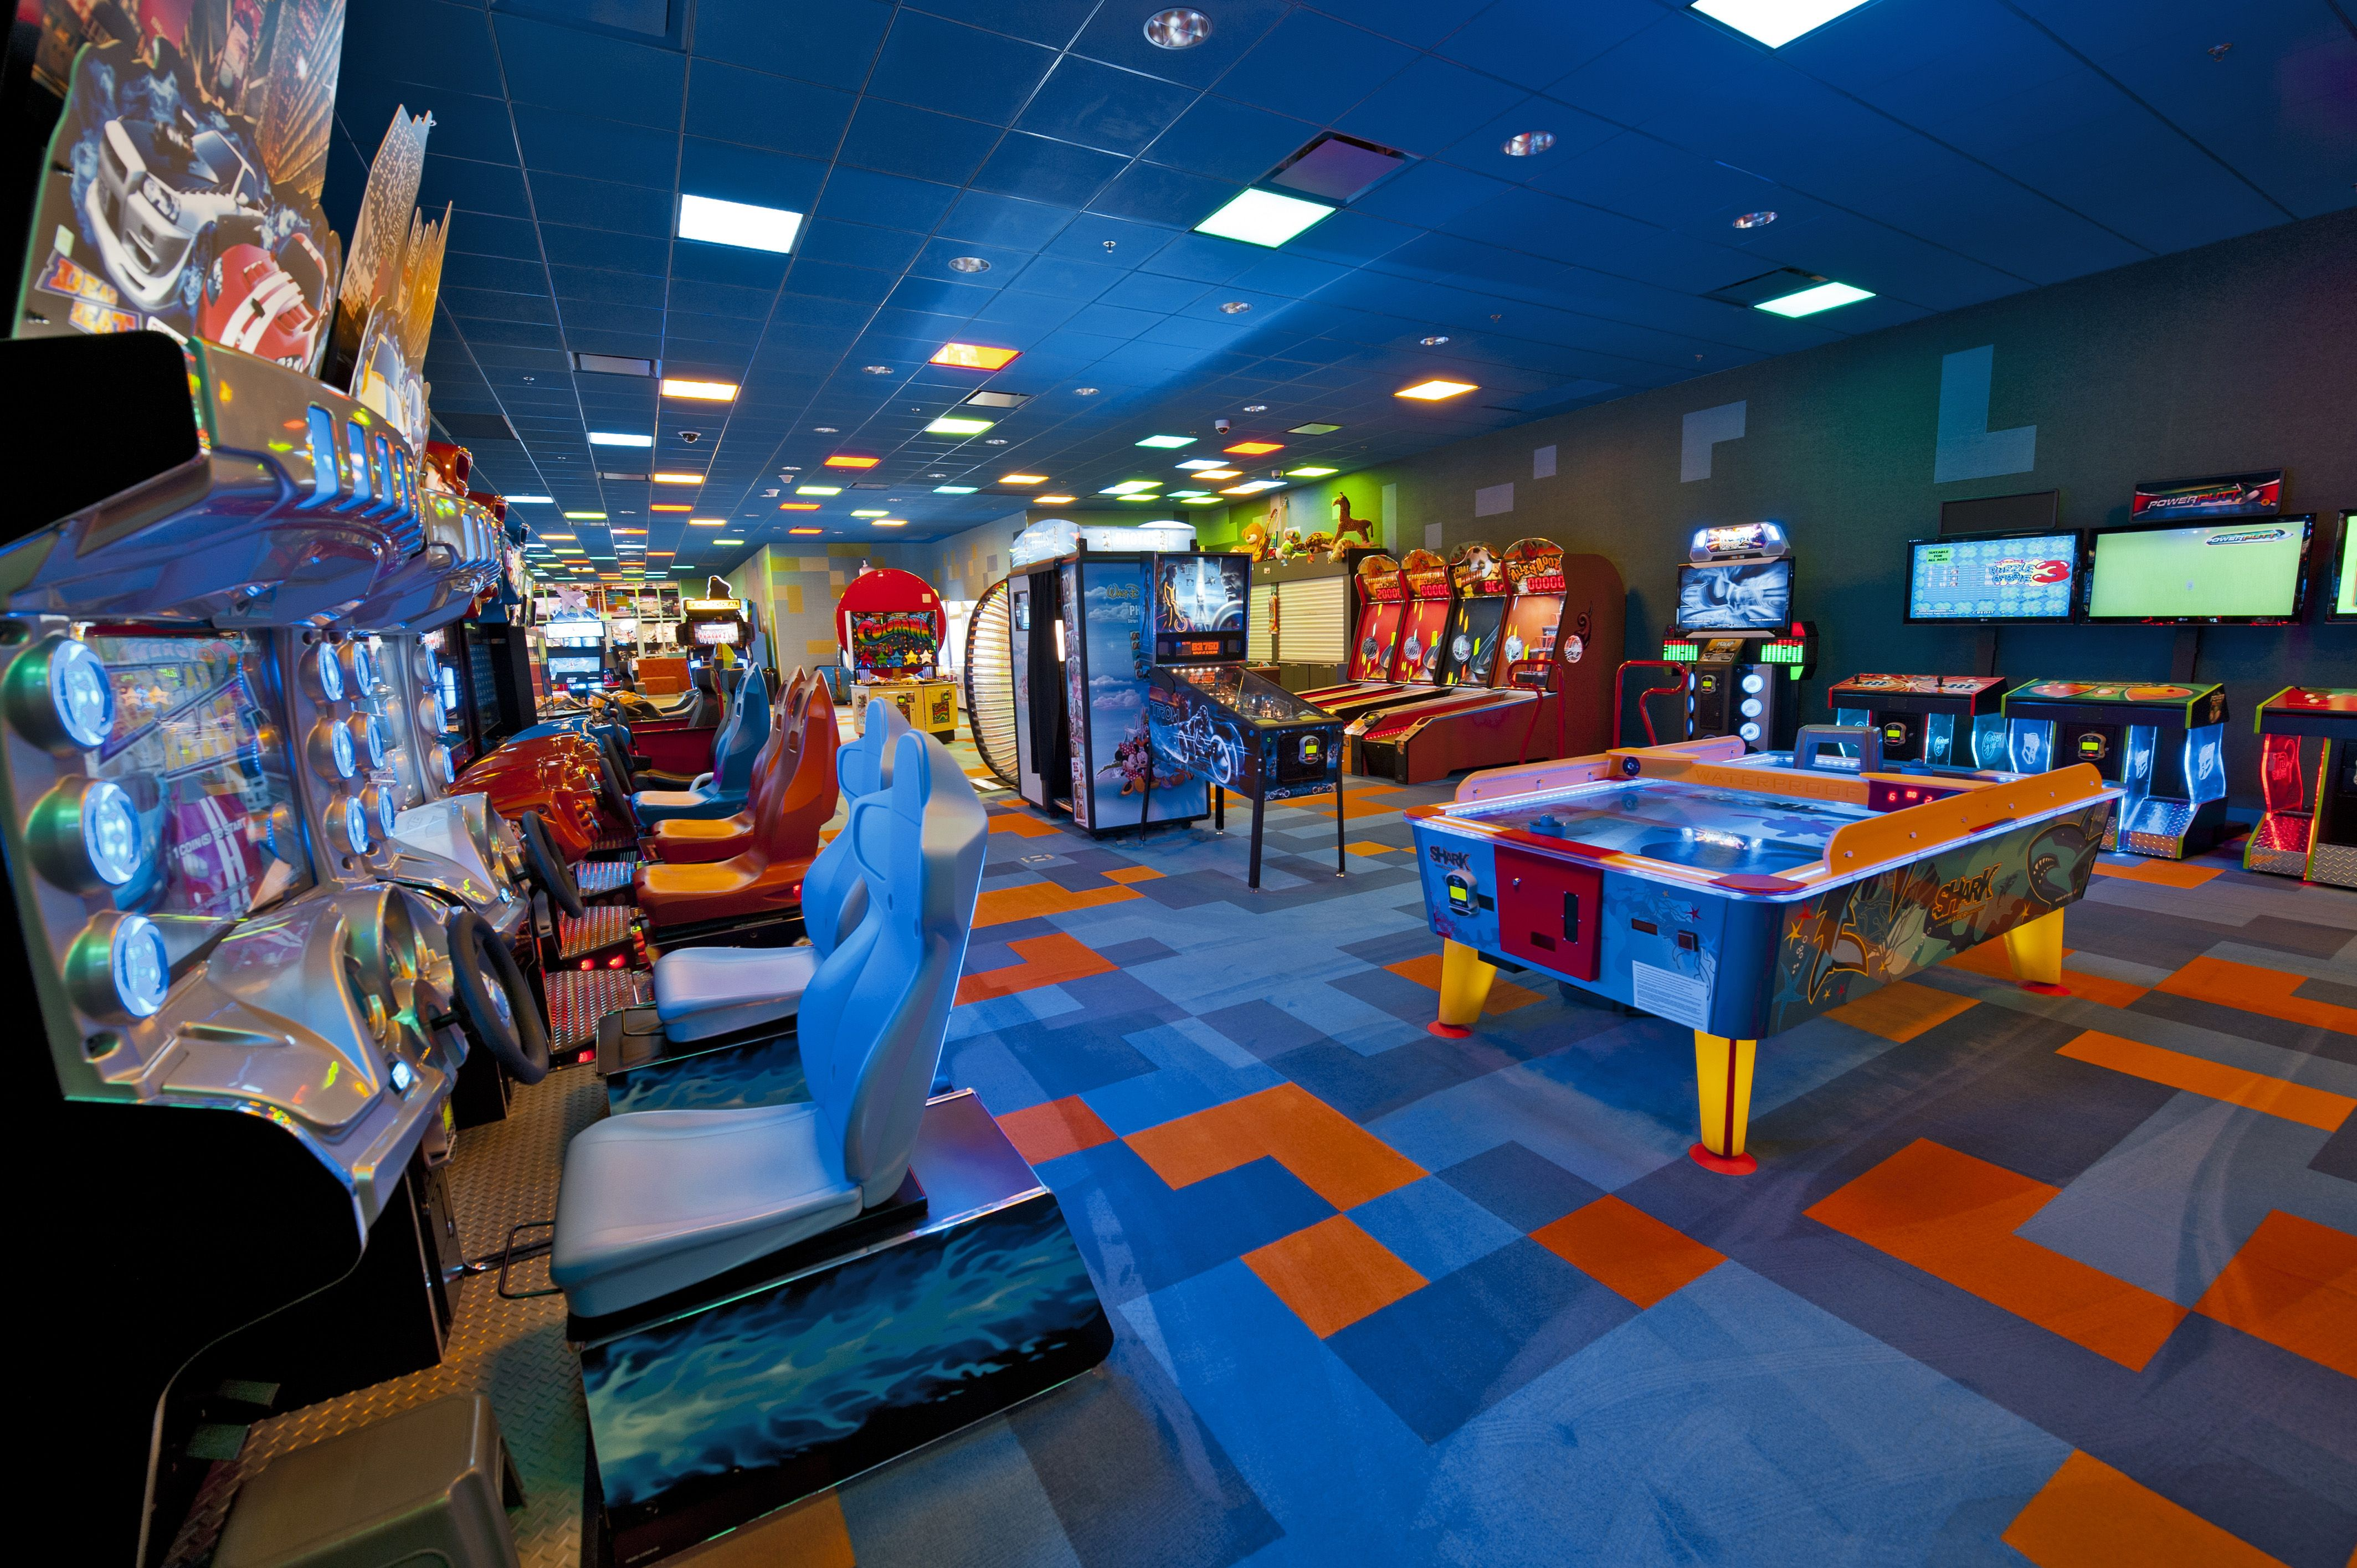 Pixel Play Arcade at Disney's Art of Animation